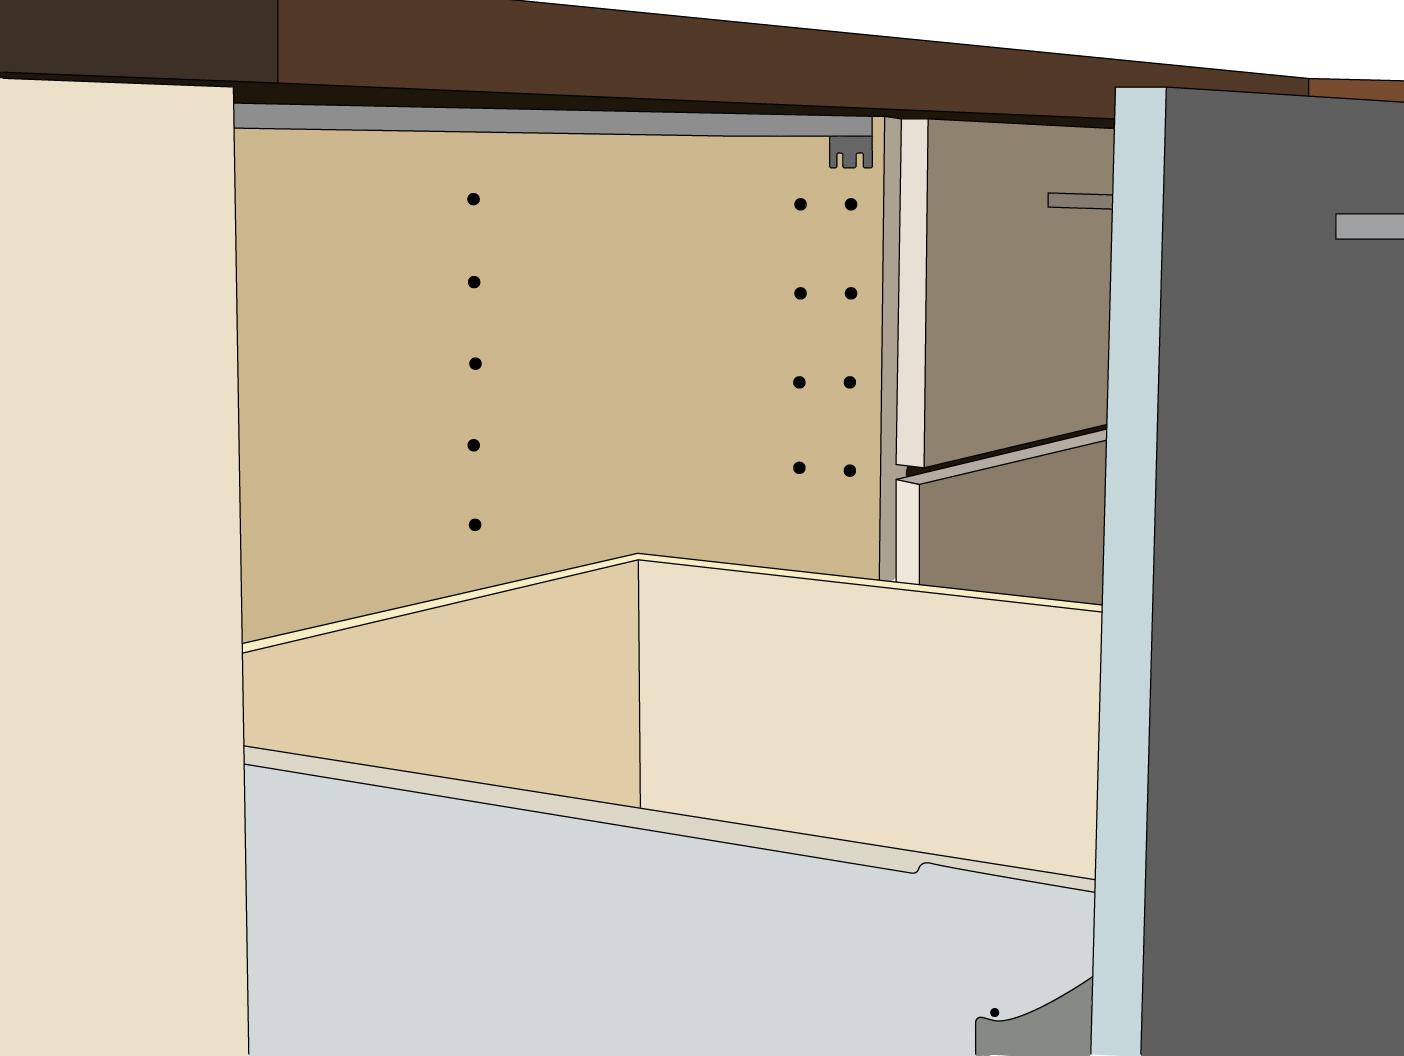 Making sense of IKEA kitchen cabinet lighting Pt  1